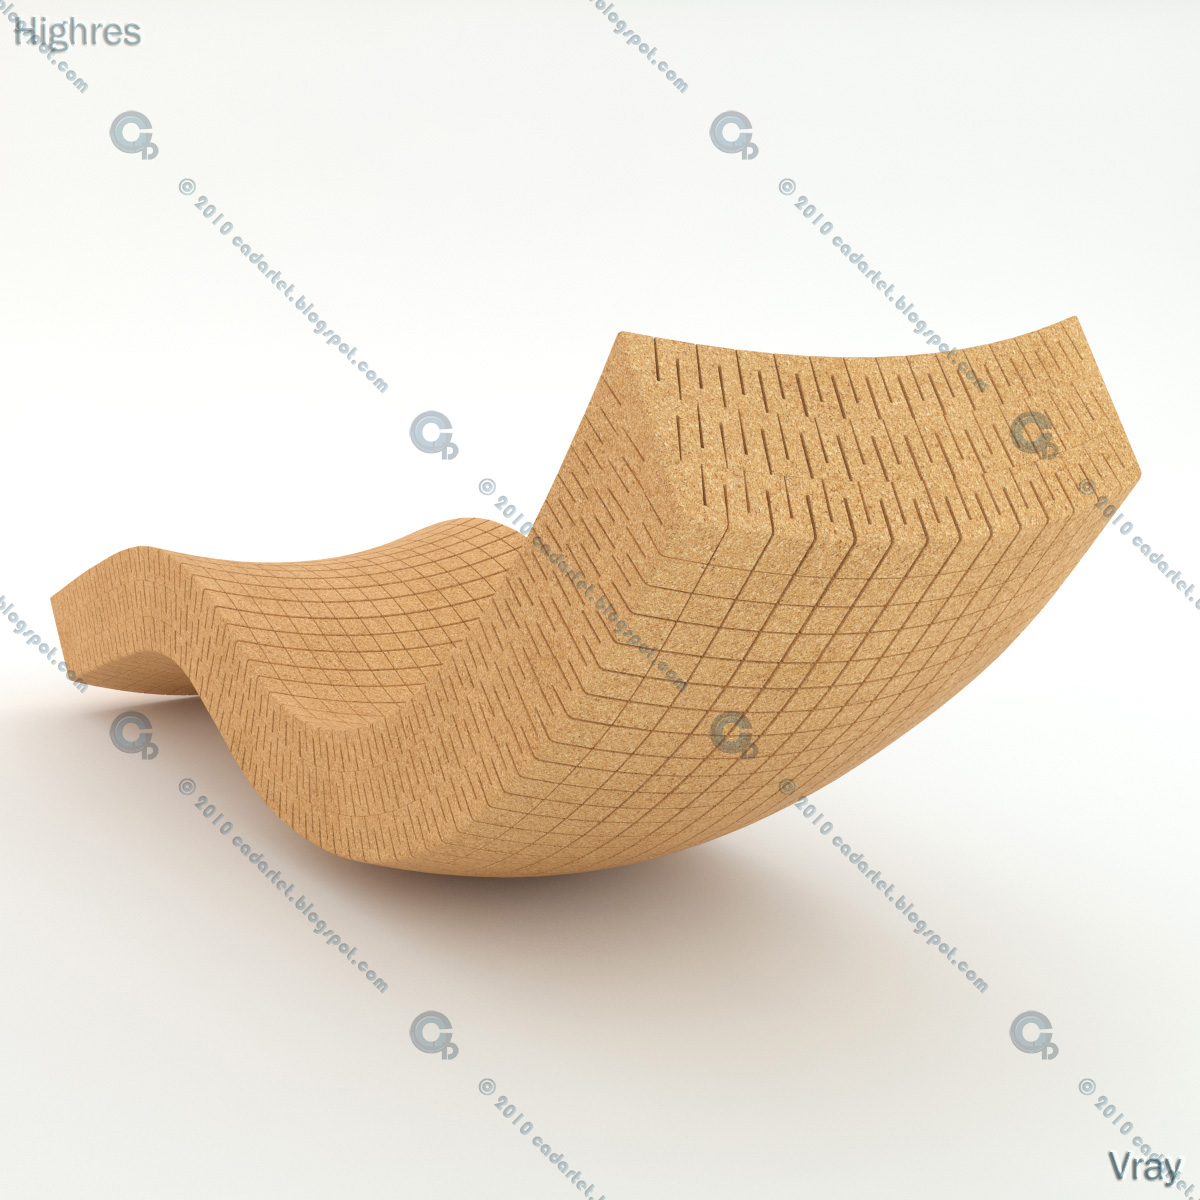 Cadartet cork chaise longue 3d model for Chaise modele